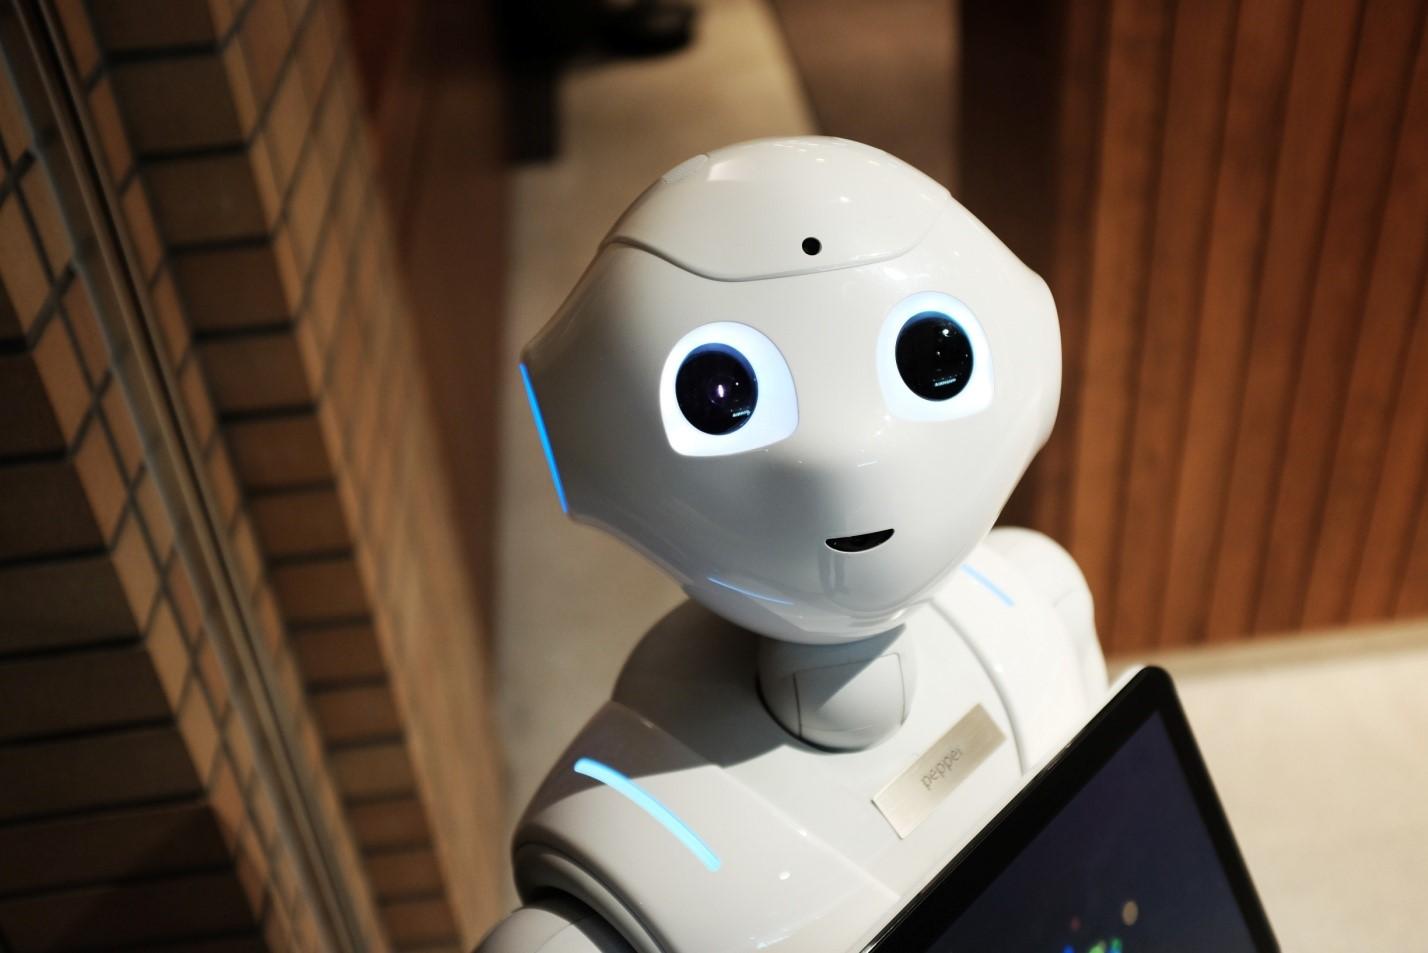 Cost savings using artificial intelligence